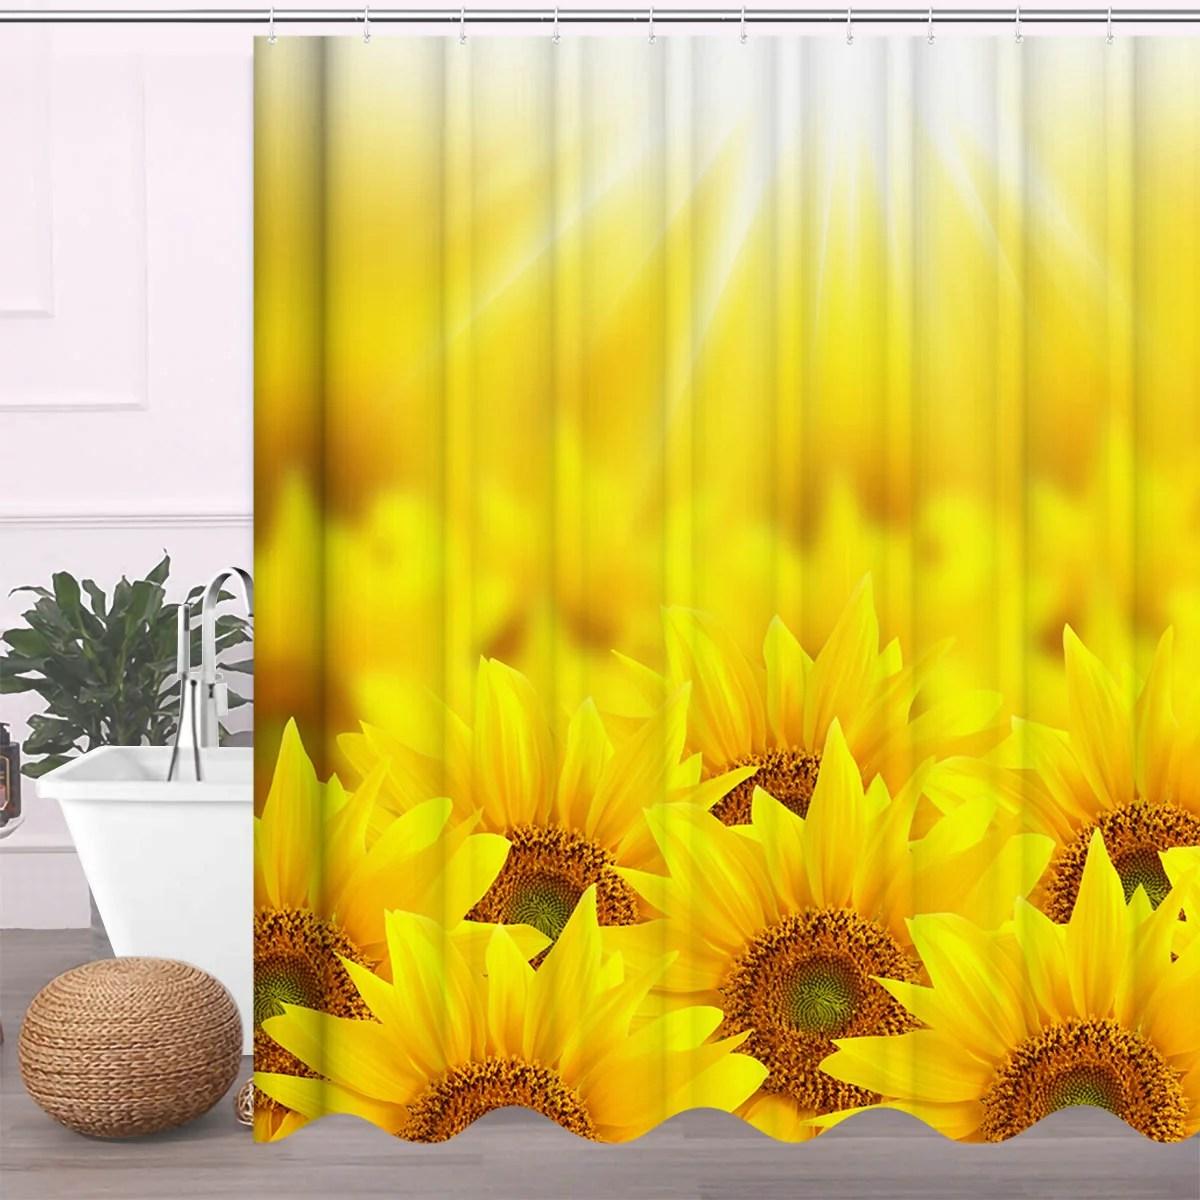 sunflower shower curtain sets with 3pcs non slip rugs toilet lid cover bath mat sunflower bathroom decor bathtub curtain waterproof cloth fabric